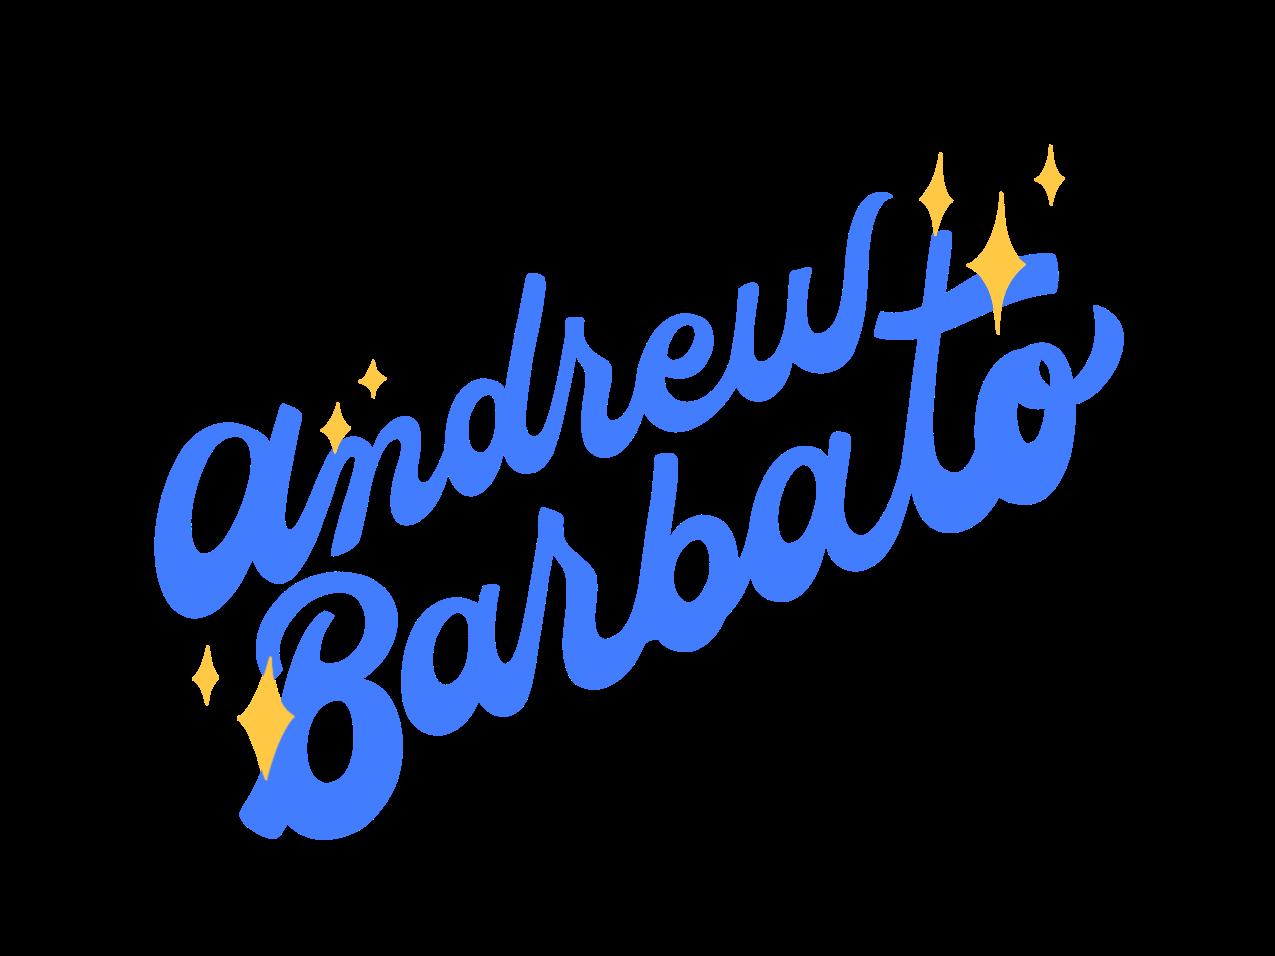 Alt Sparkle Script Logo wordmark comedian andrew sparkle alternate alt logo logo branding typography illustration design